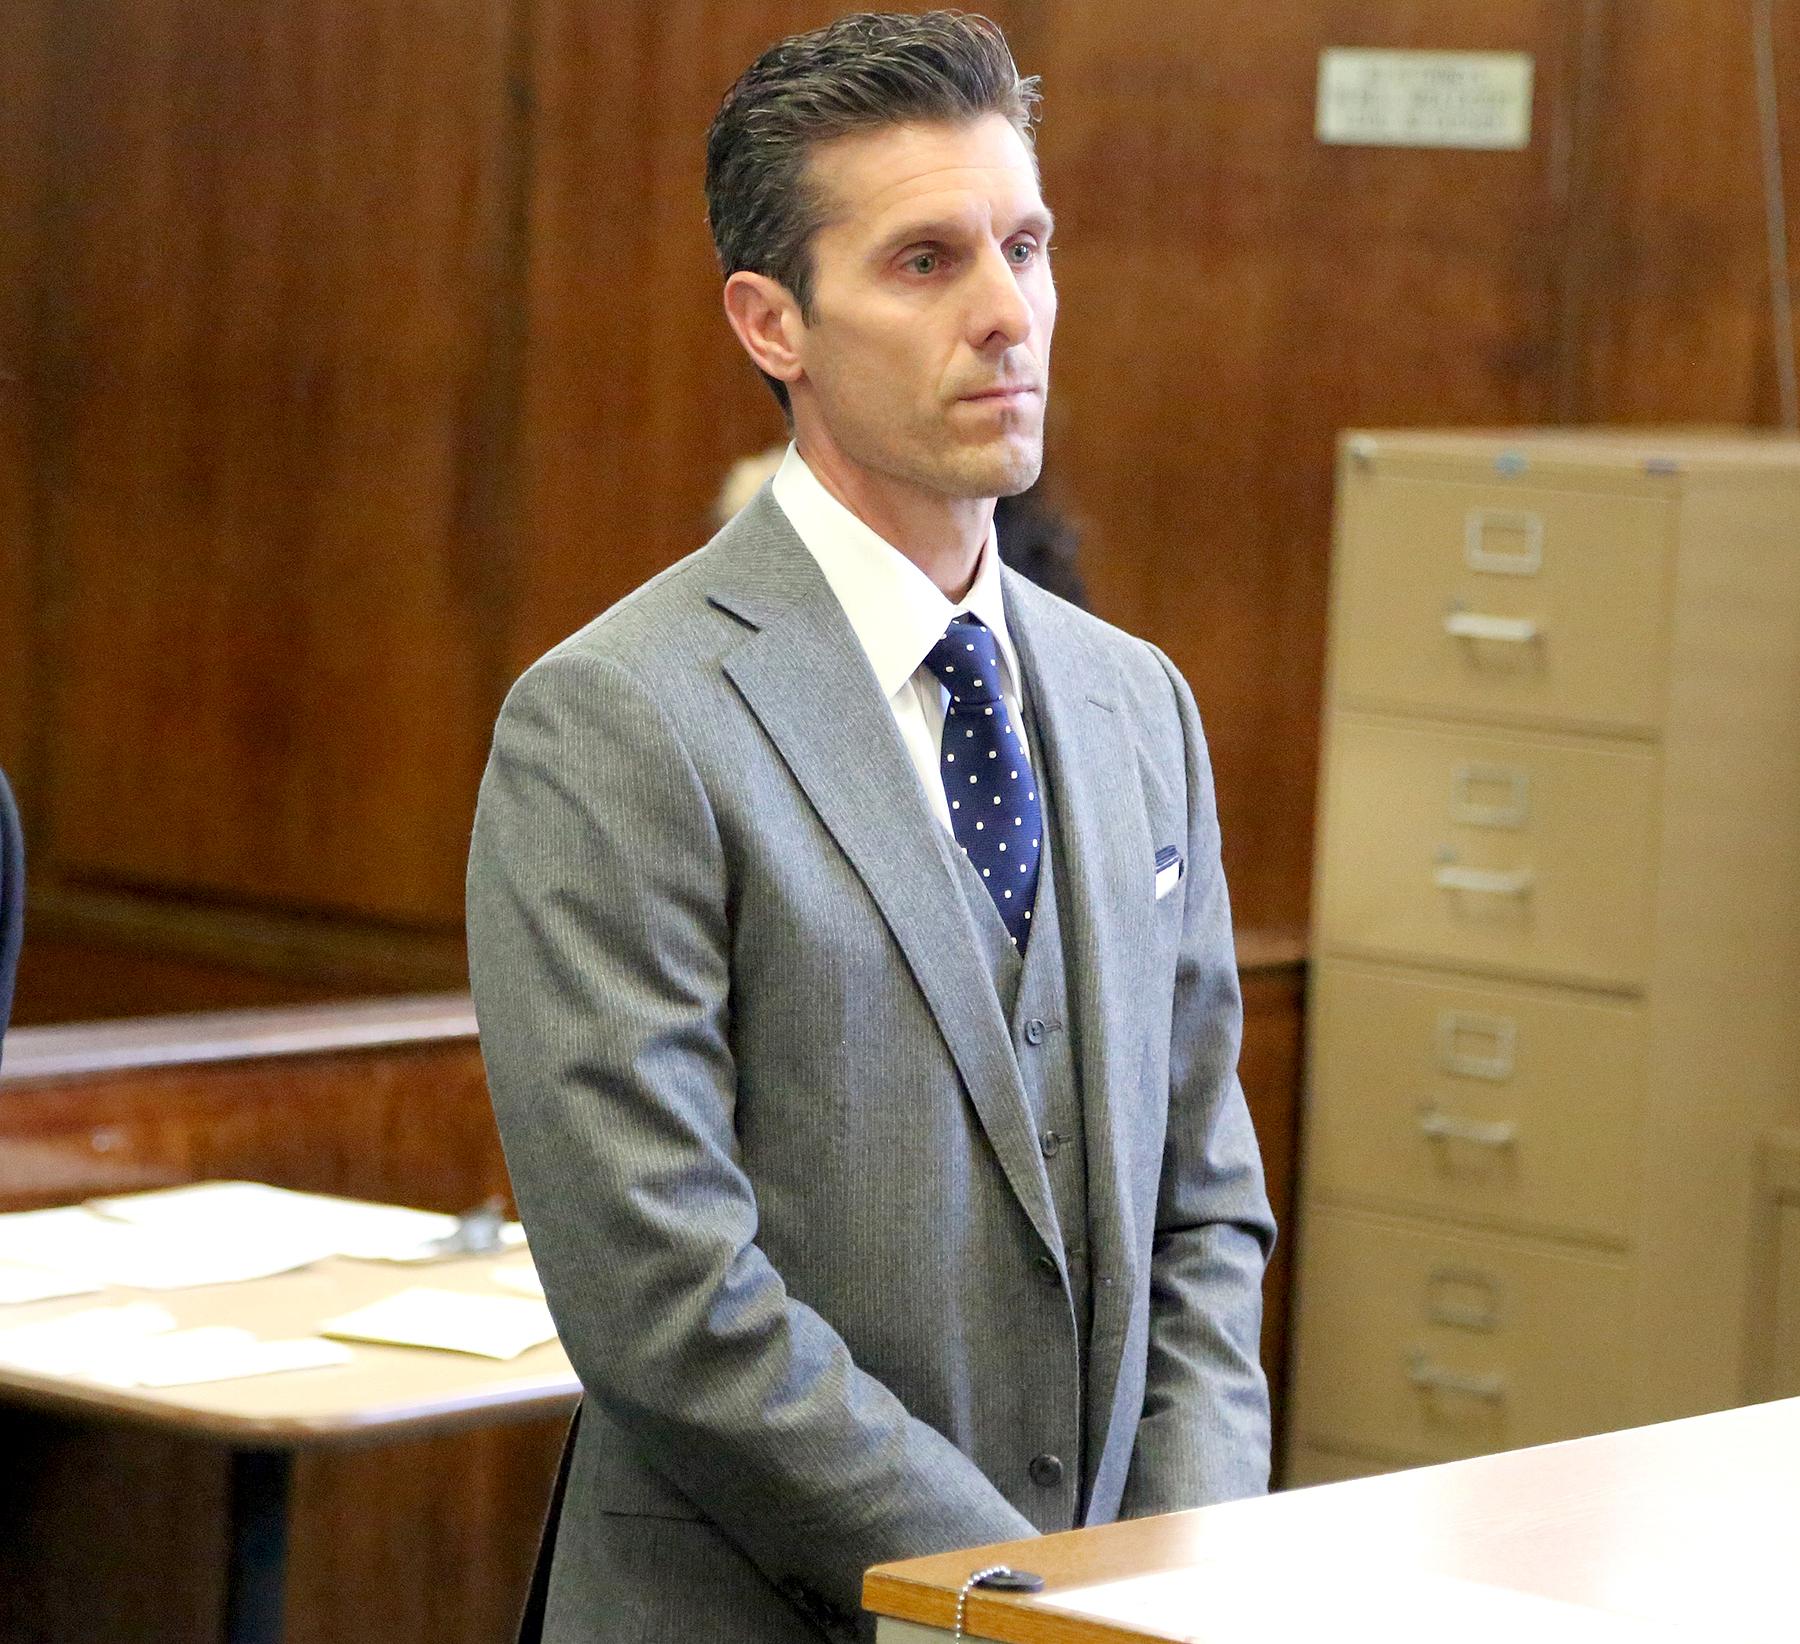 Jason Hoppy appears in Manhattan Criminal Court on Monday, March 13, 2017.